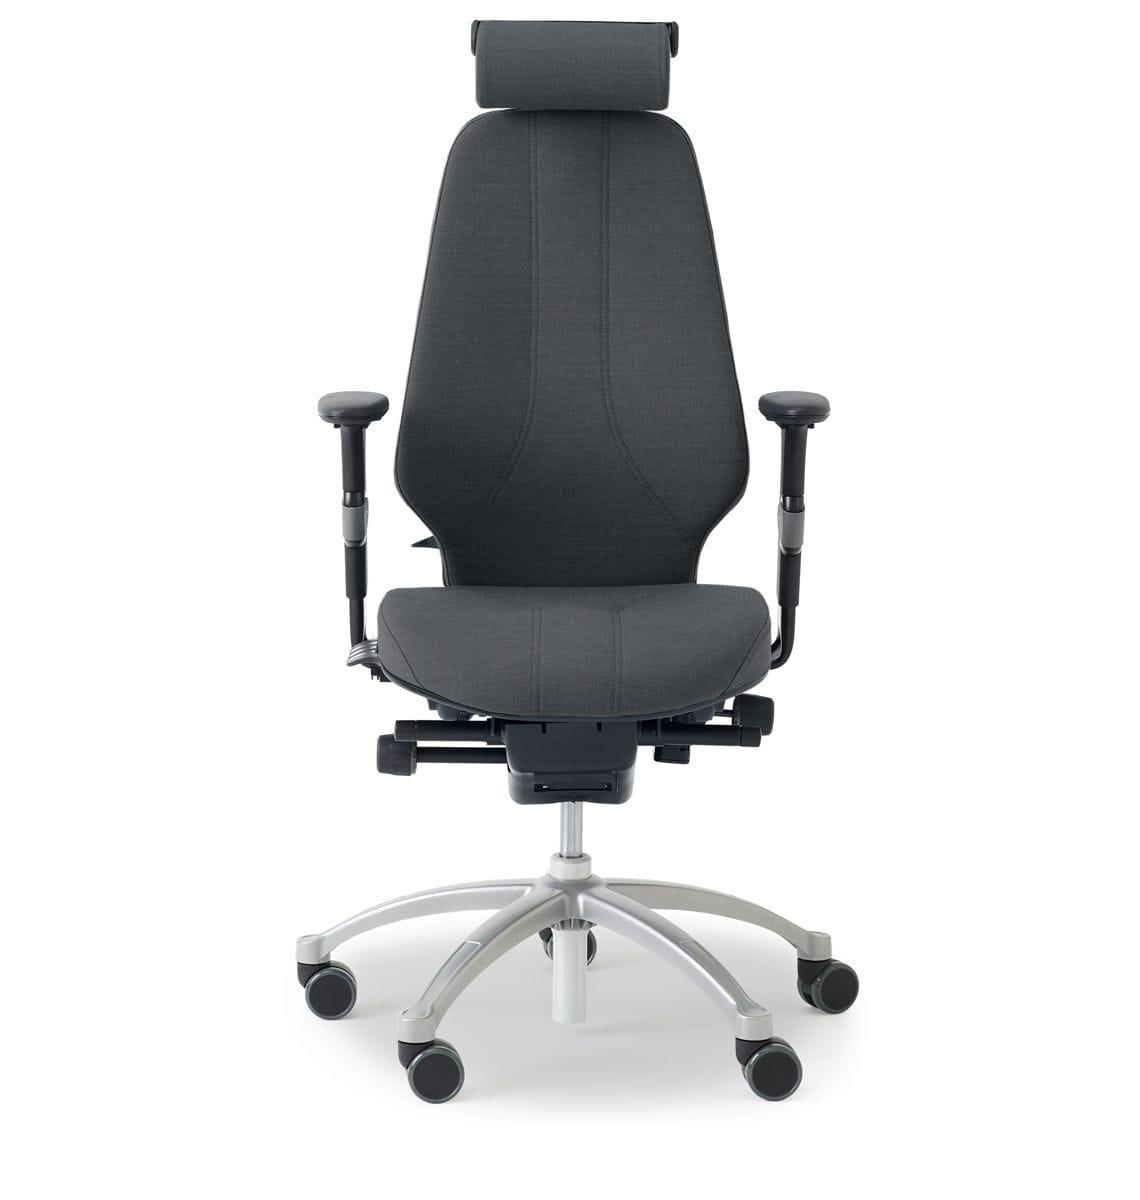 Sedia da ufficio moderna - RH LOGIC 400 COMFORT - HÅG ...